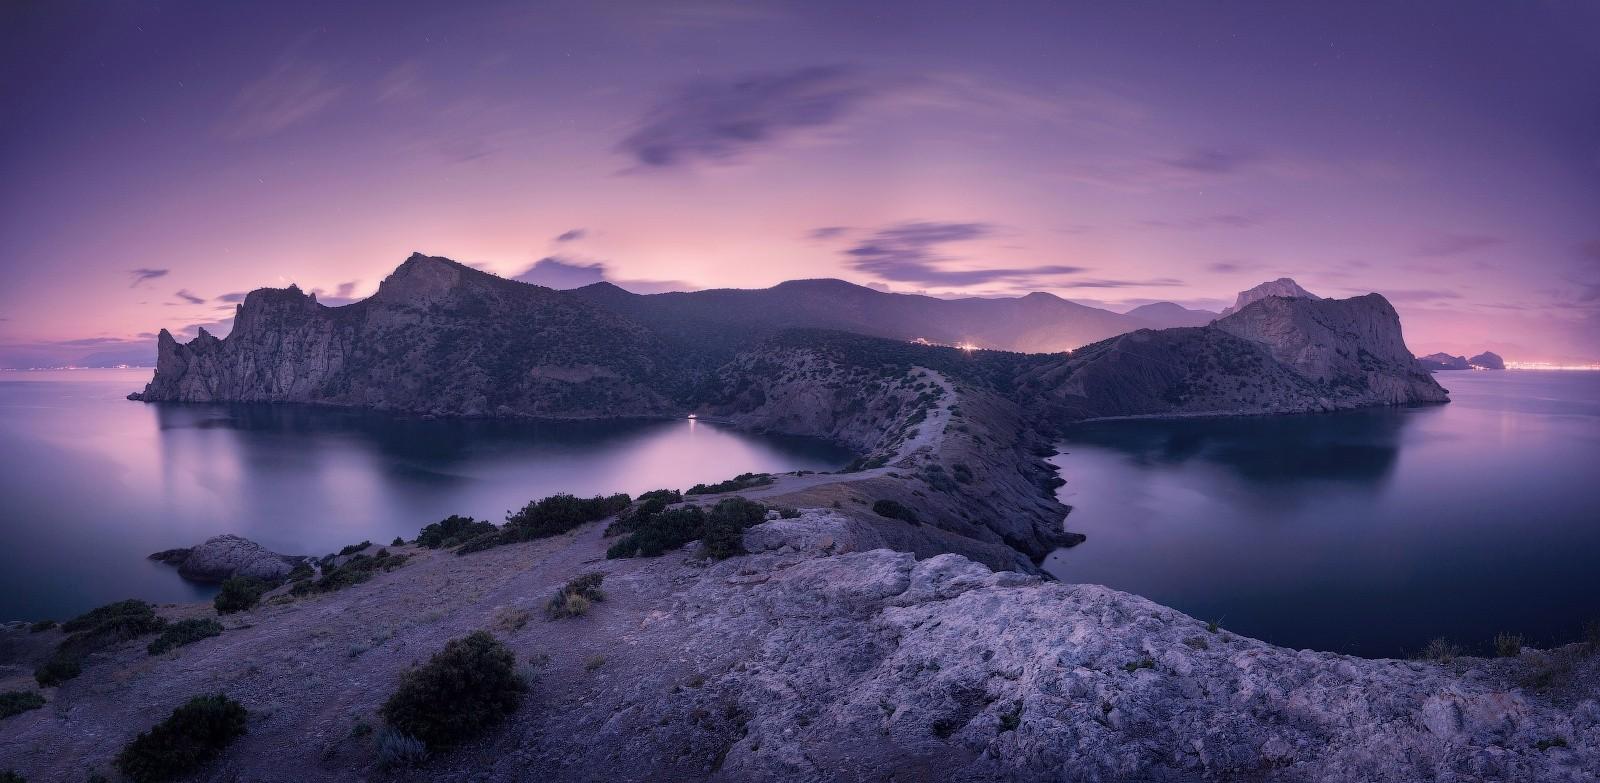 peninsula beach water crimea black sea landscape sunset shrubs mountains nature panoramas